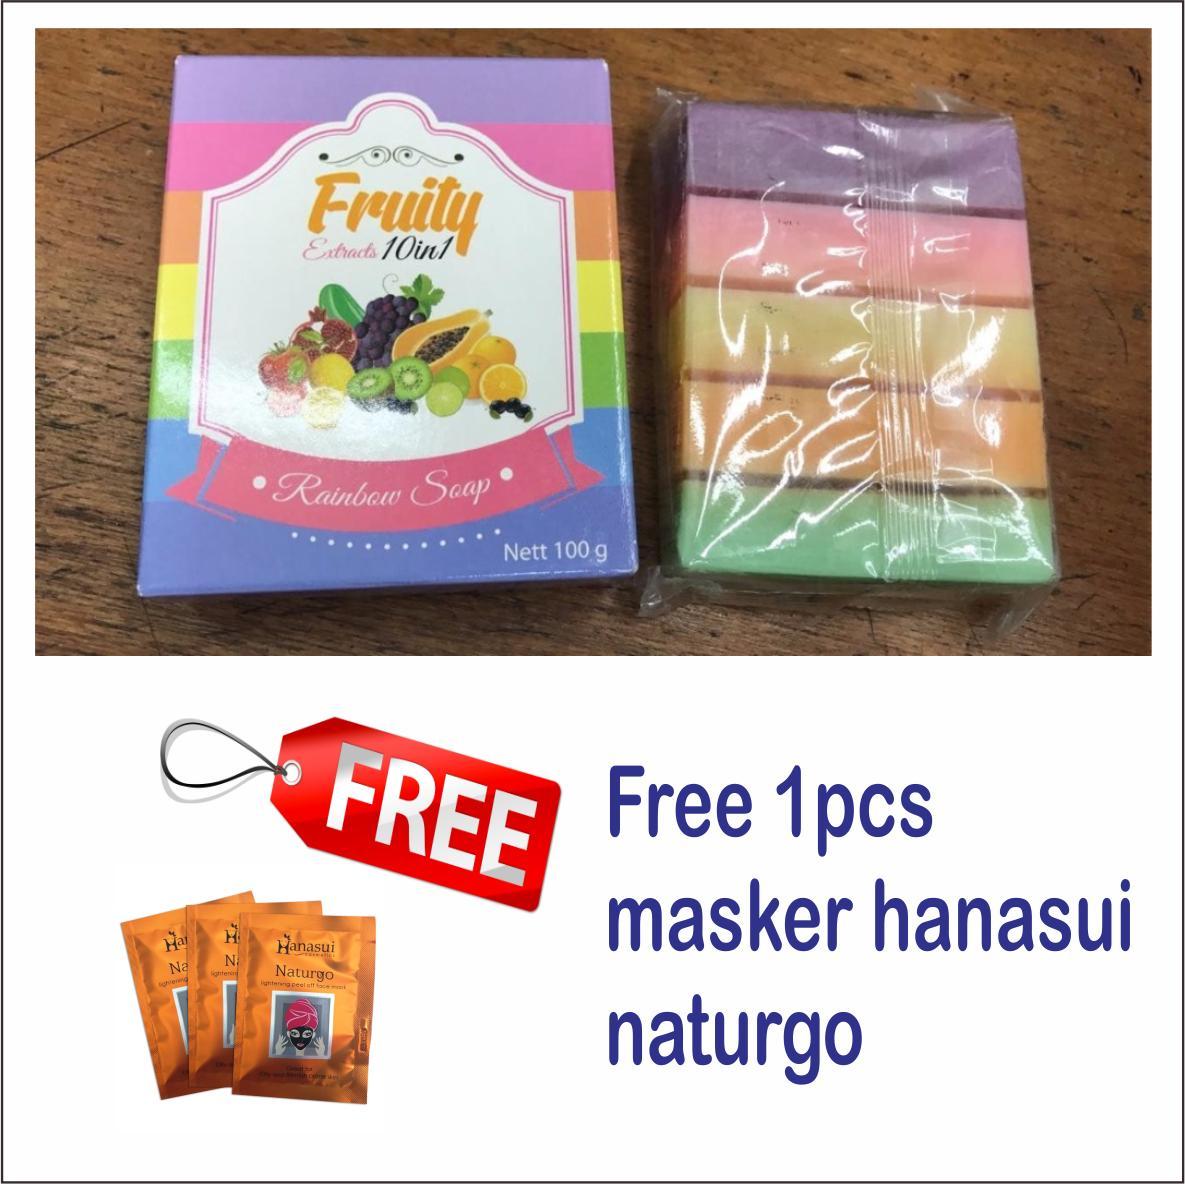 Fruity Rainbow Soap 10 in 1 Whitening Soap Fruitamin Original Sabun Pemutih Badan BPOM - free